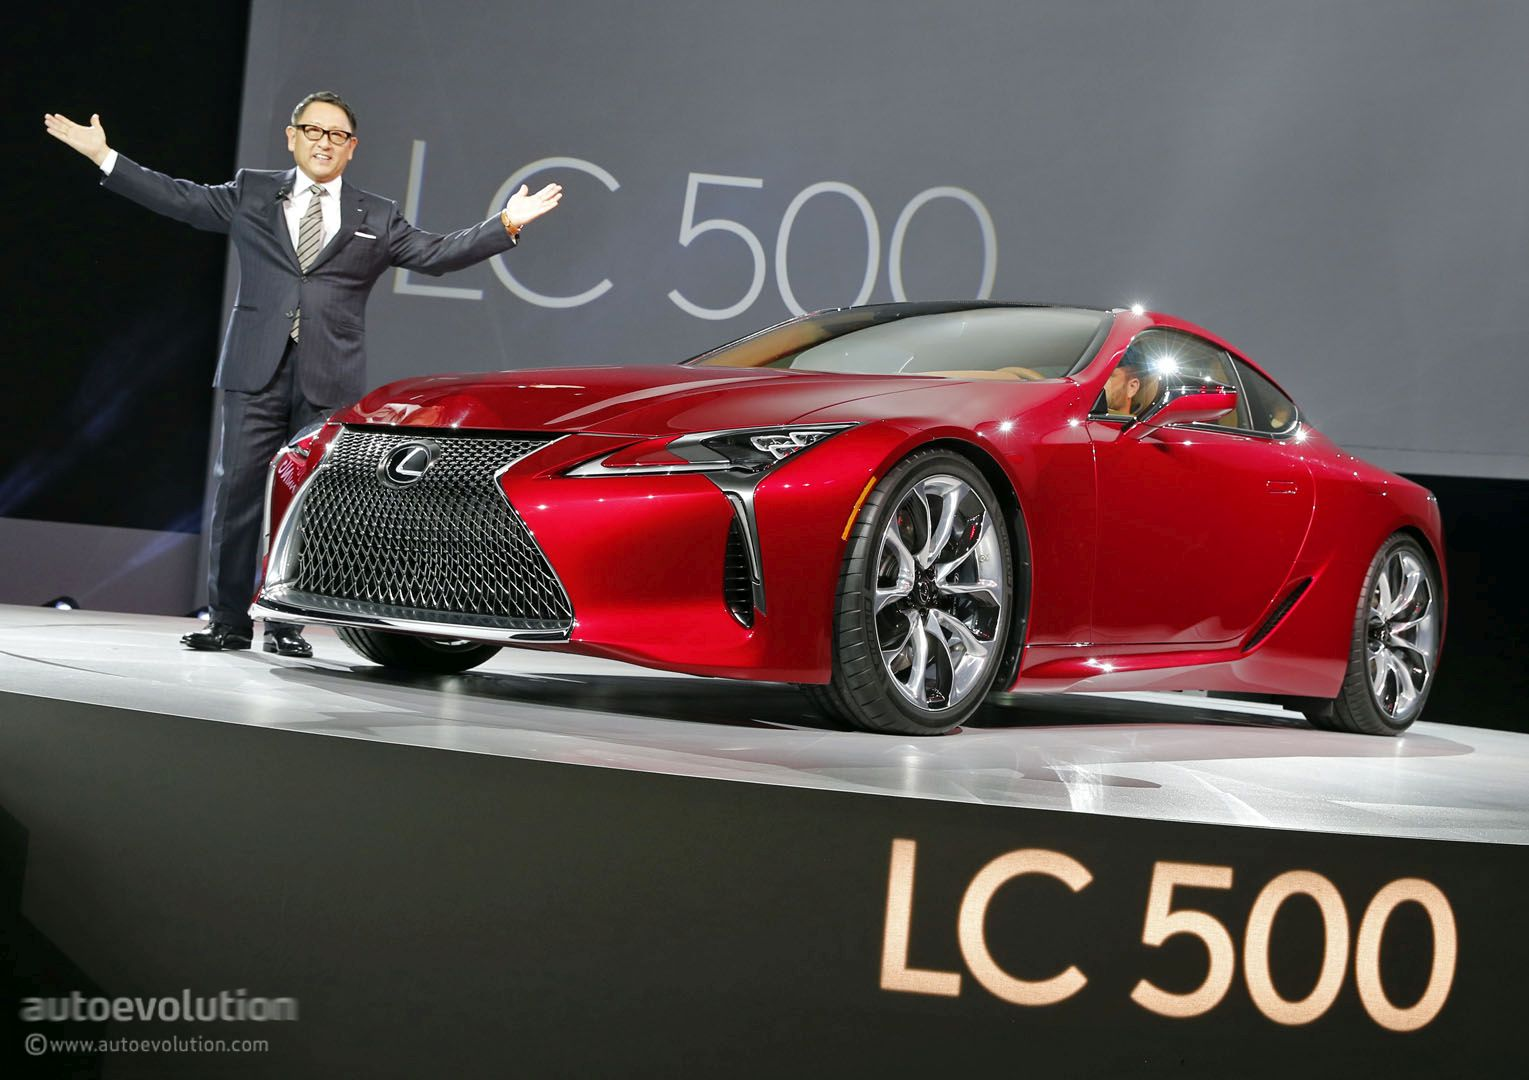 https://s1.cdn.autoevolution.com/images/news/gallery/2017-lexus-lc-500-hunts-down-mercedes-s-class-coupe-in-detroit-live-photos_1.jpg